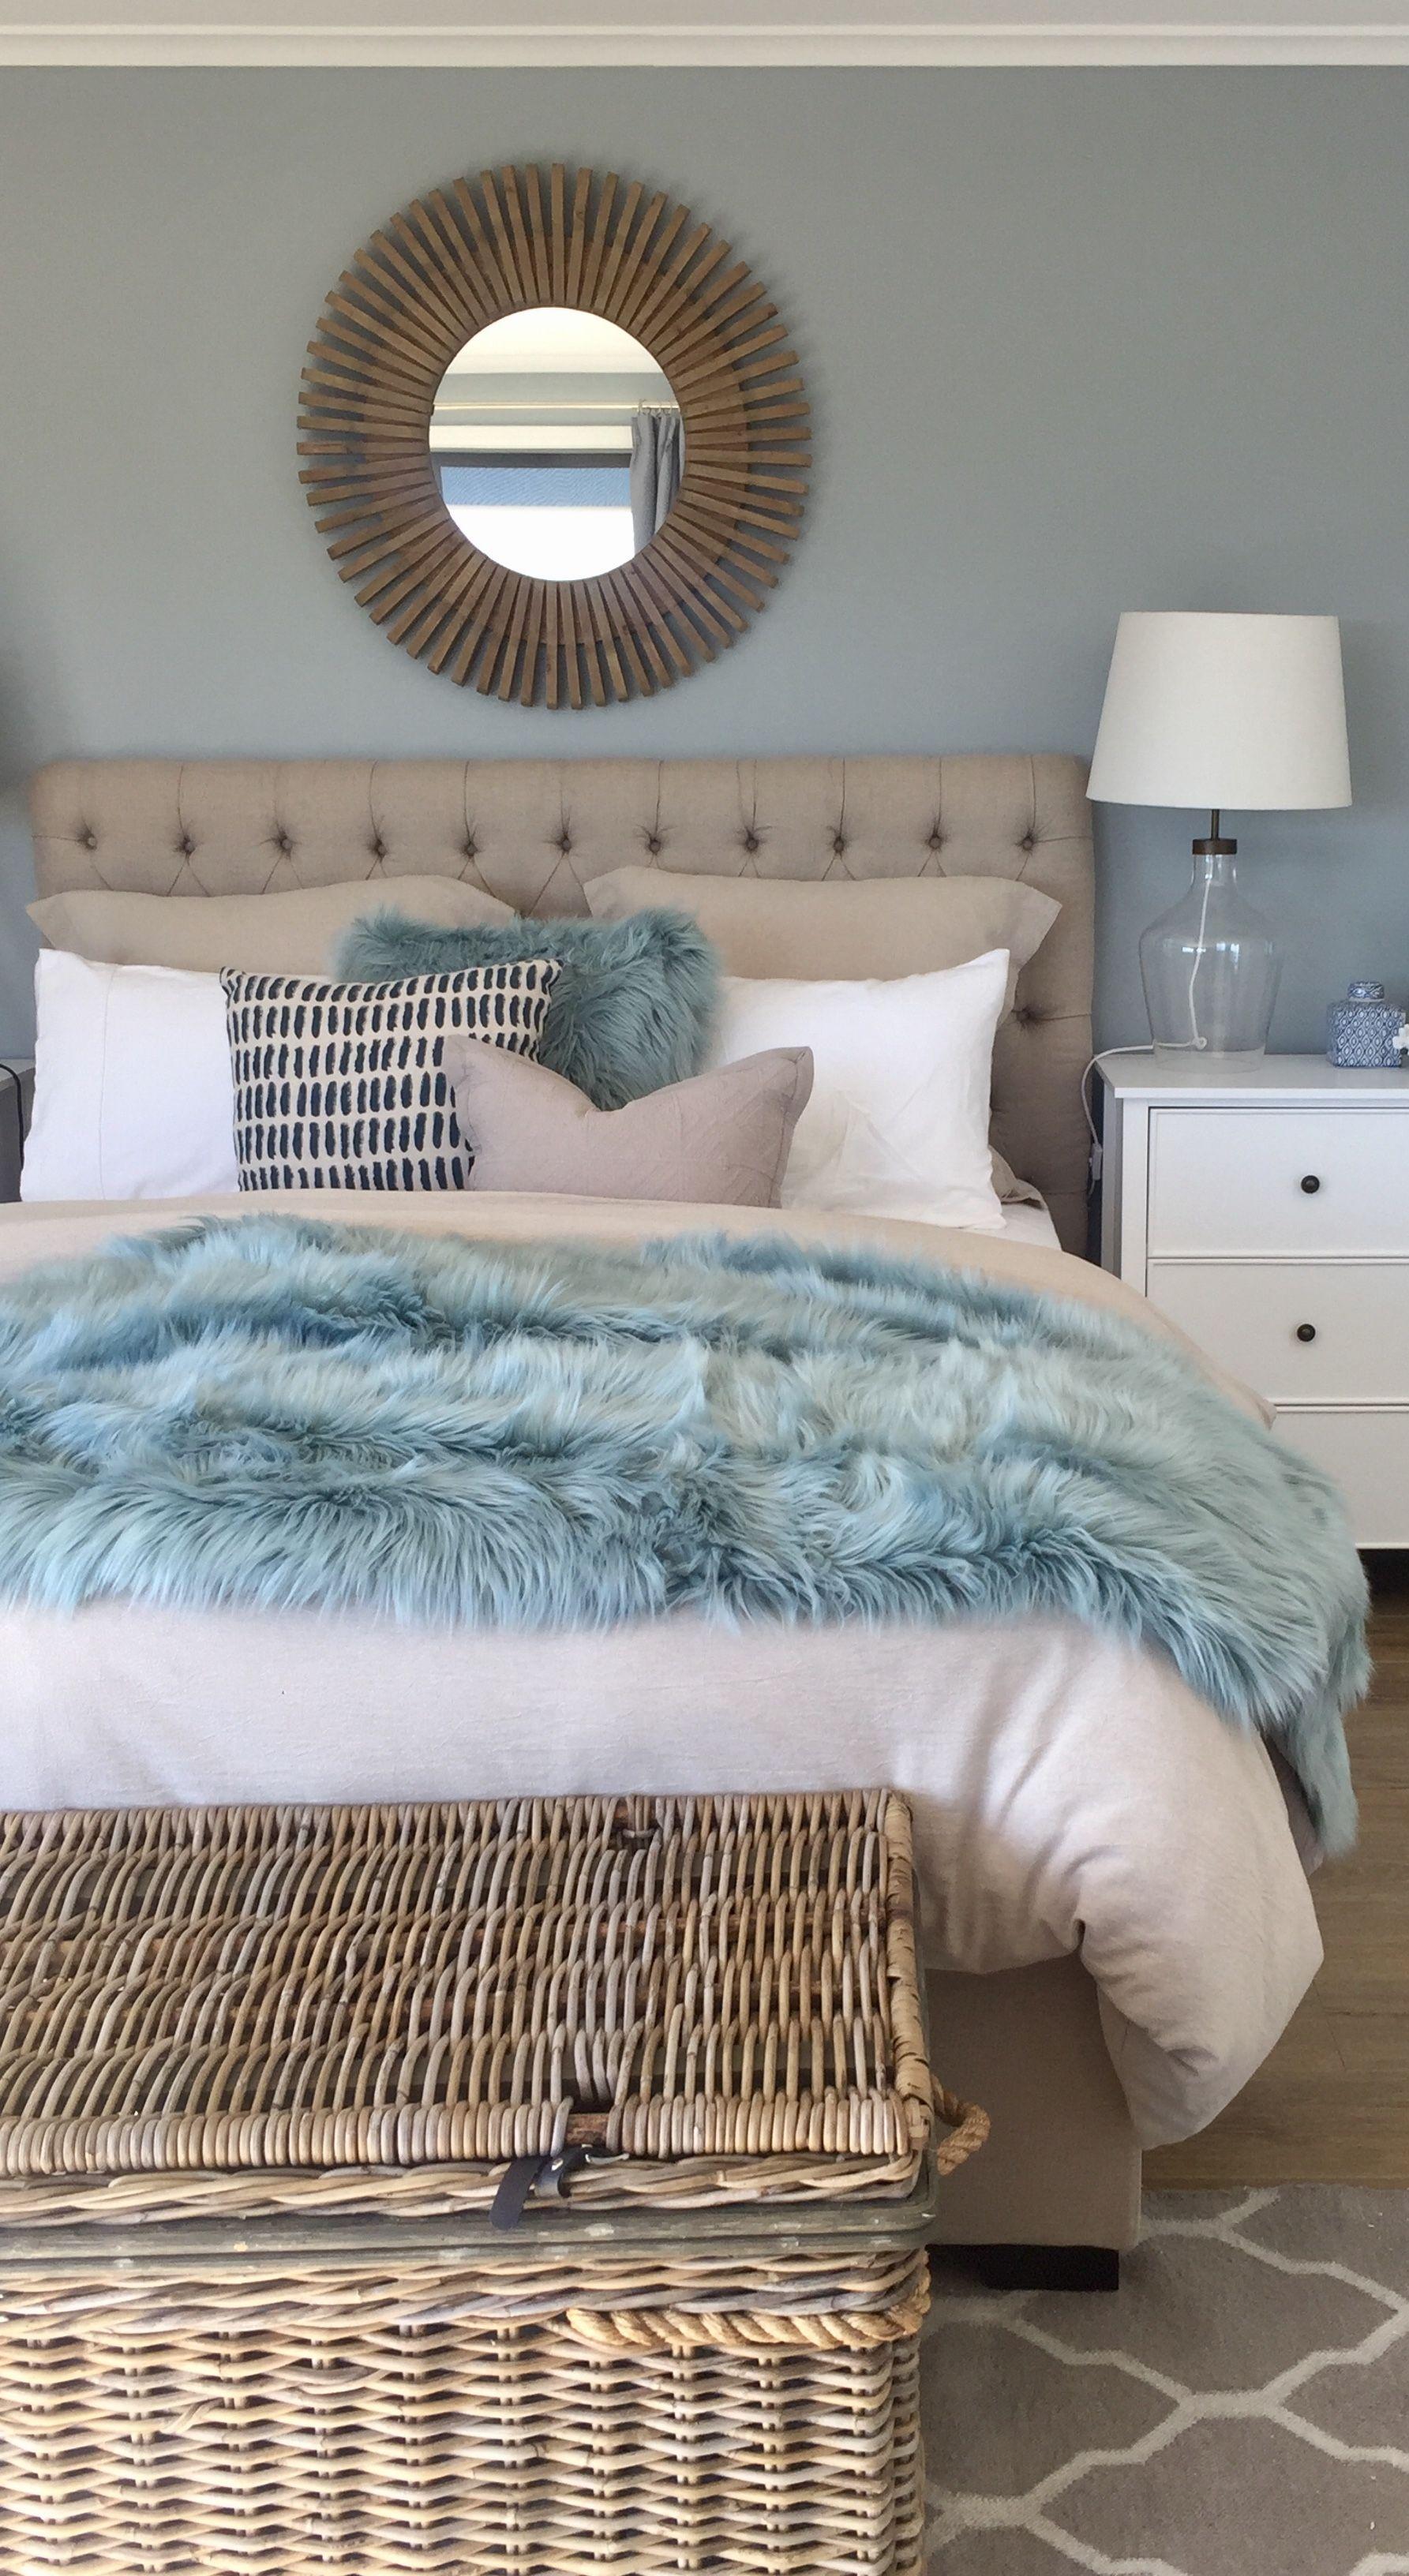 Coastal Bliss Coastal Bedroom Decorating Master Bedrooms Decor